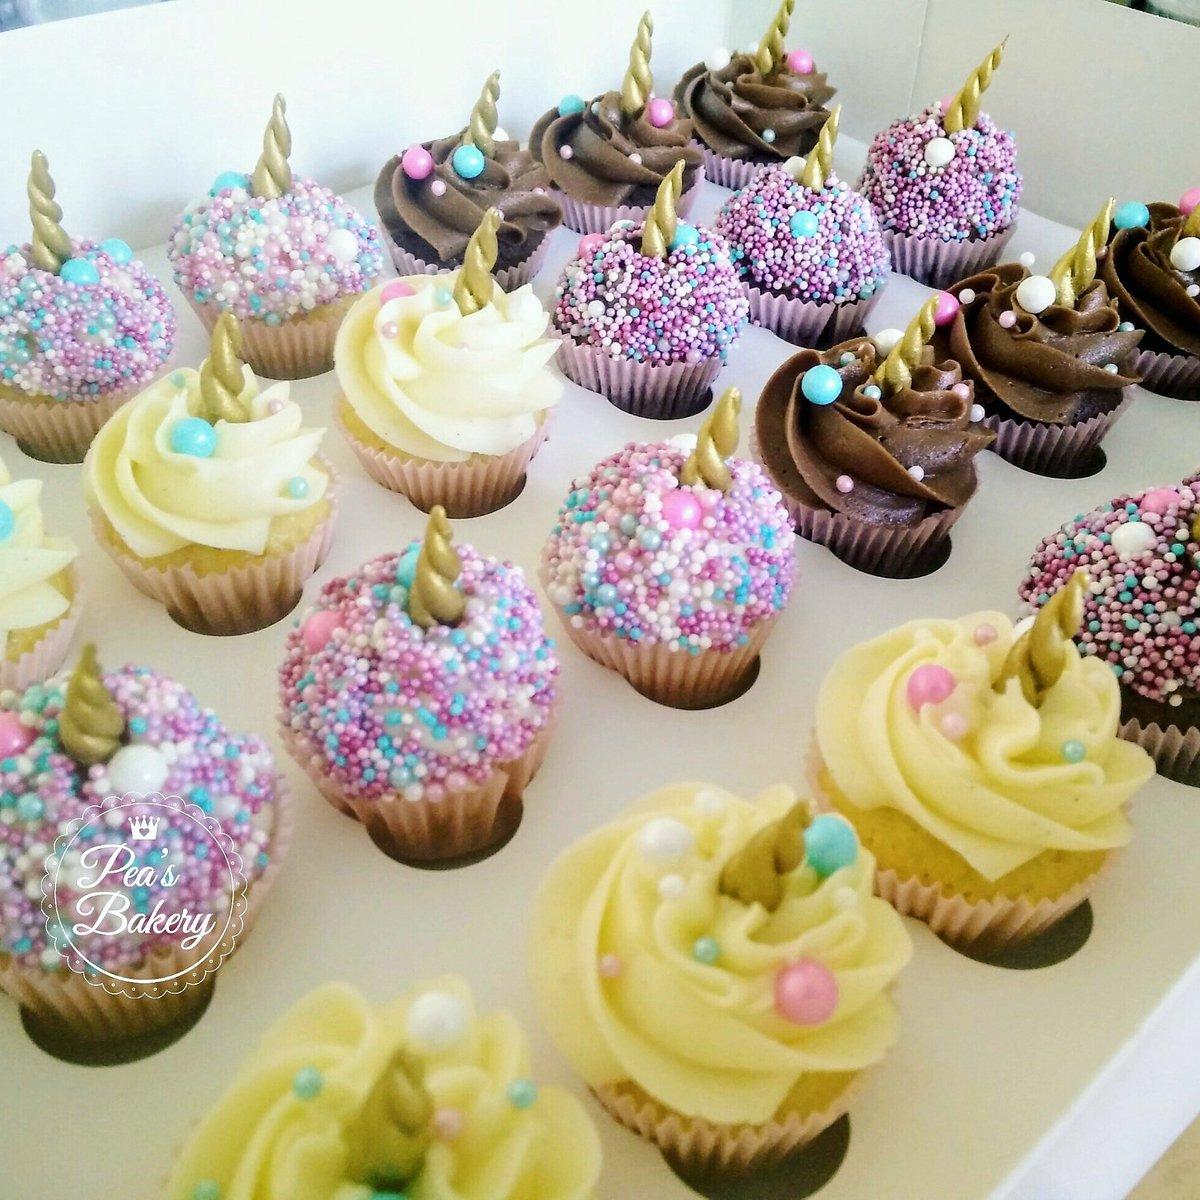 Peas Bakery On Twitter Unicorn Mini Cupcakes Nomnomnom